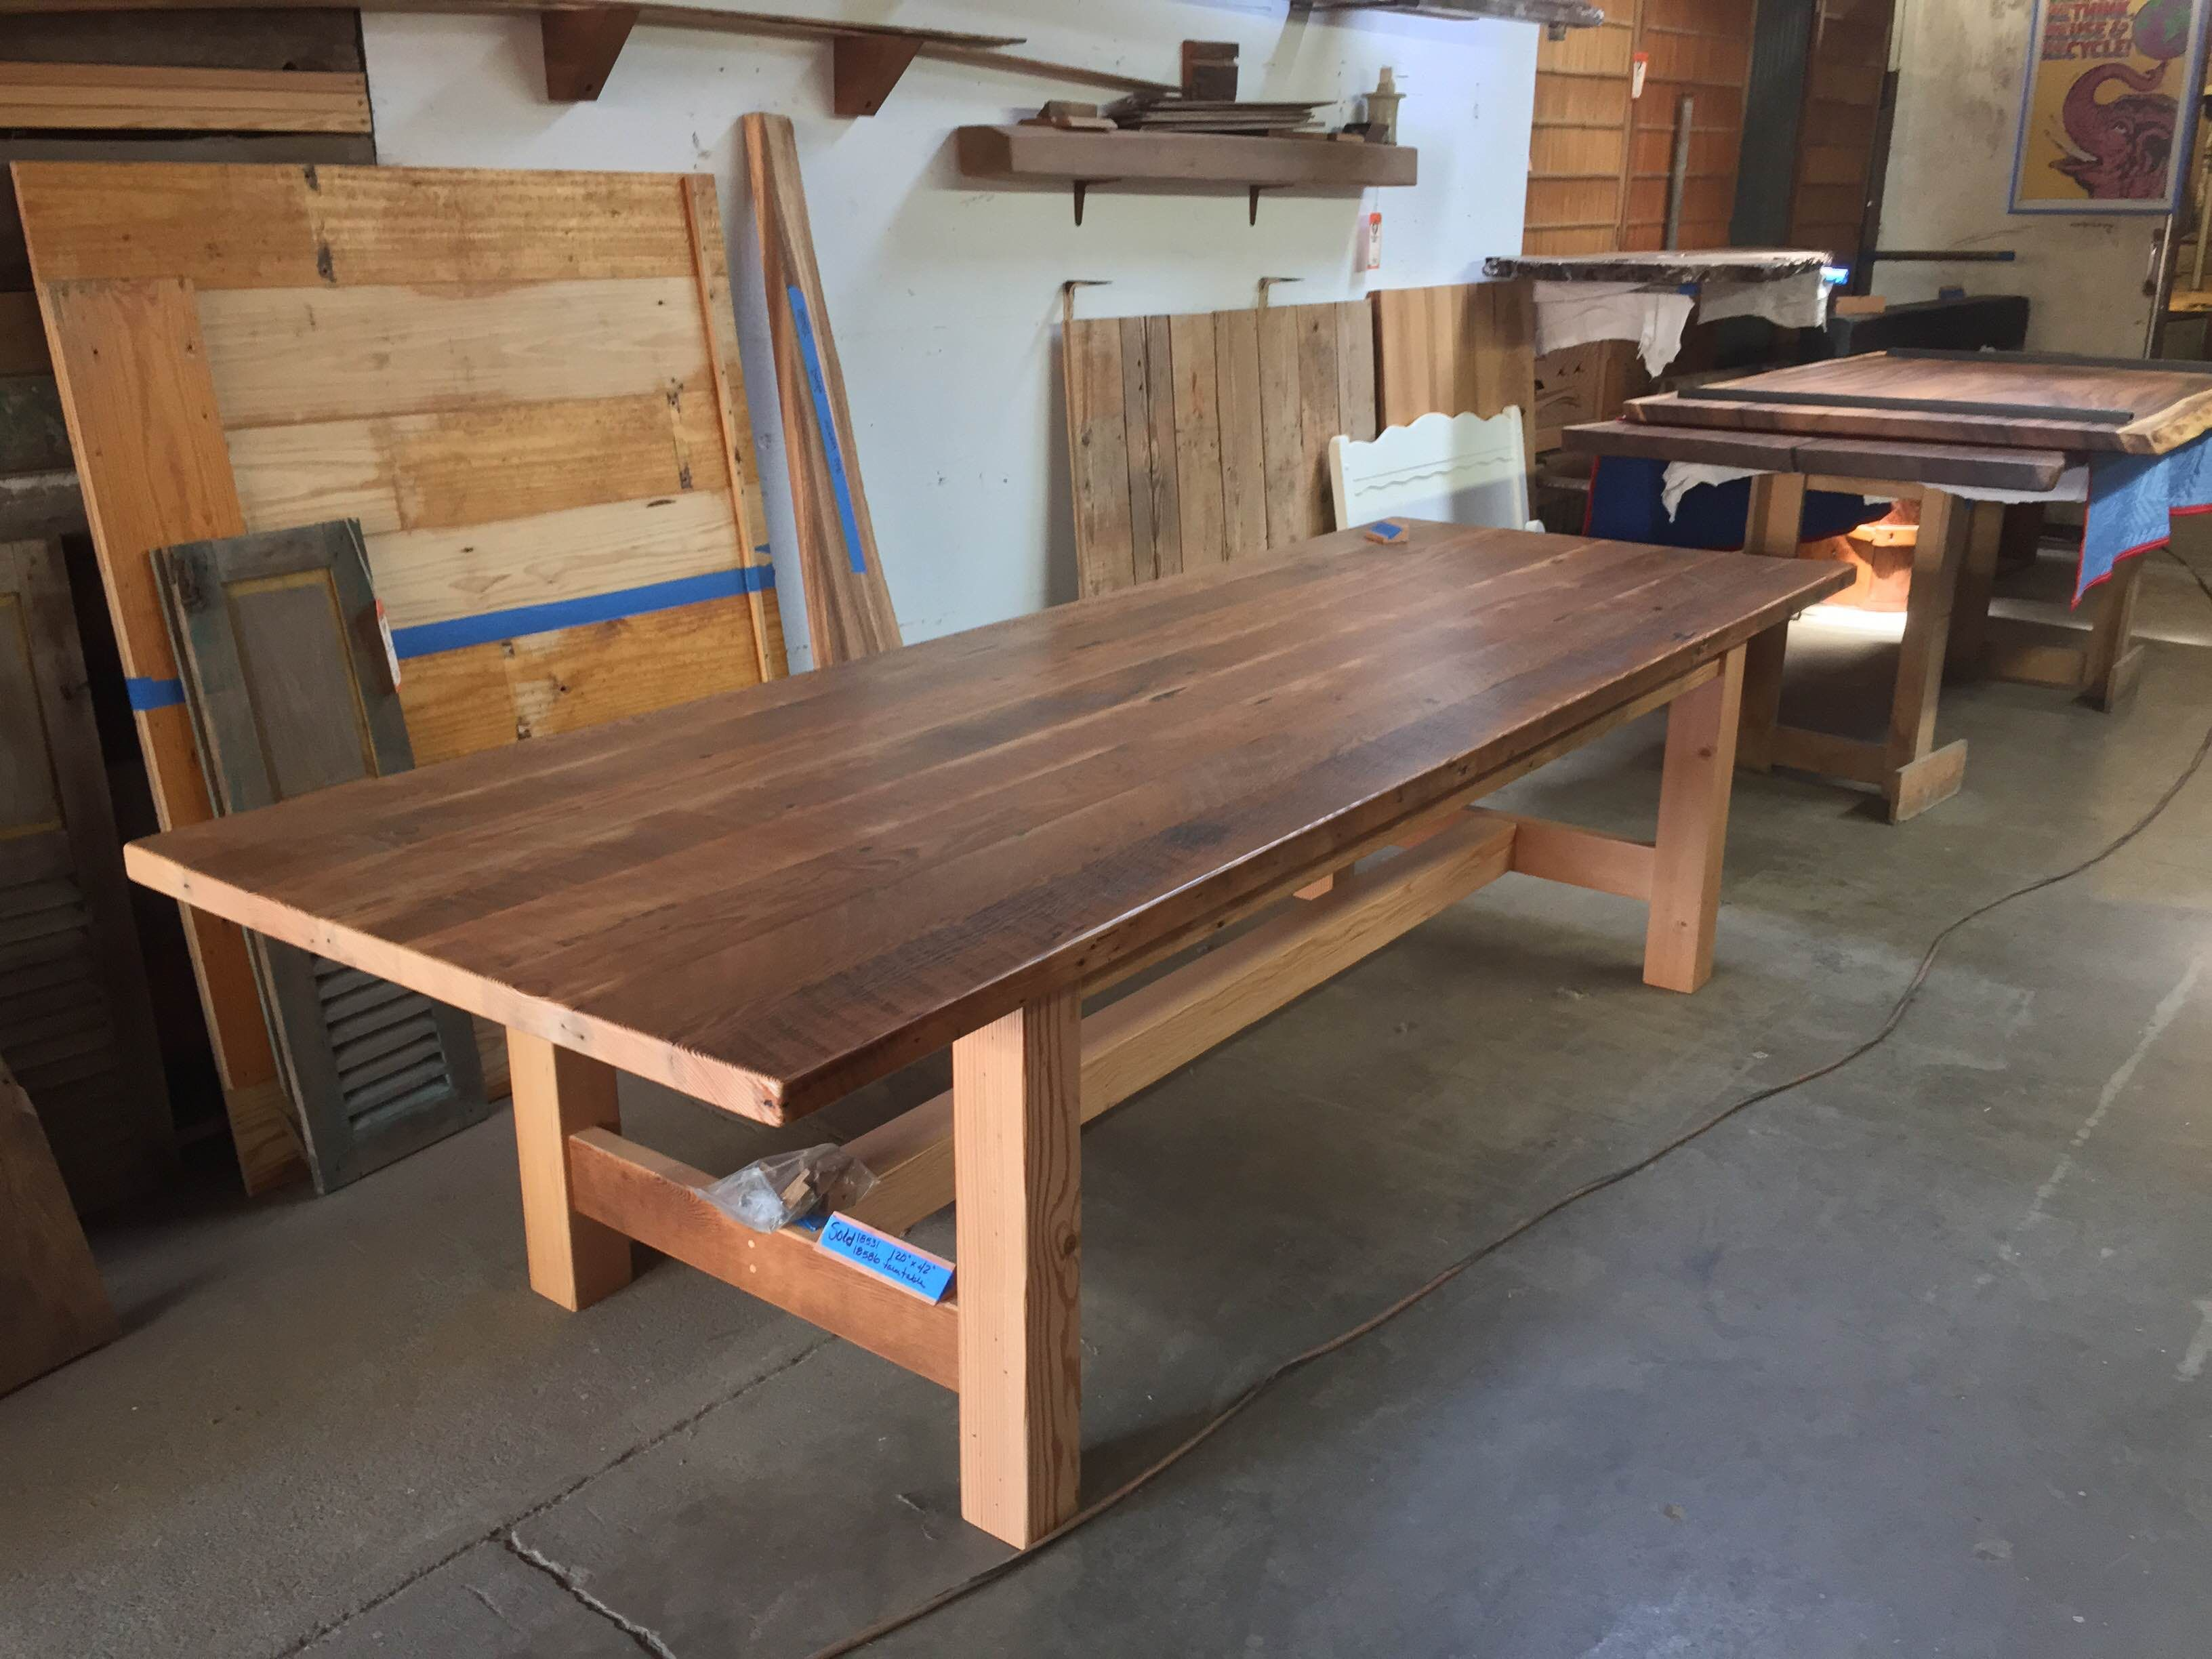 Rough Sawn Douglas Fir Craftsman Style Dining Table Furniture